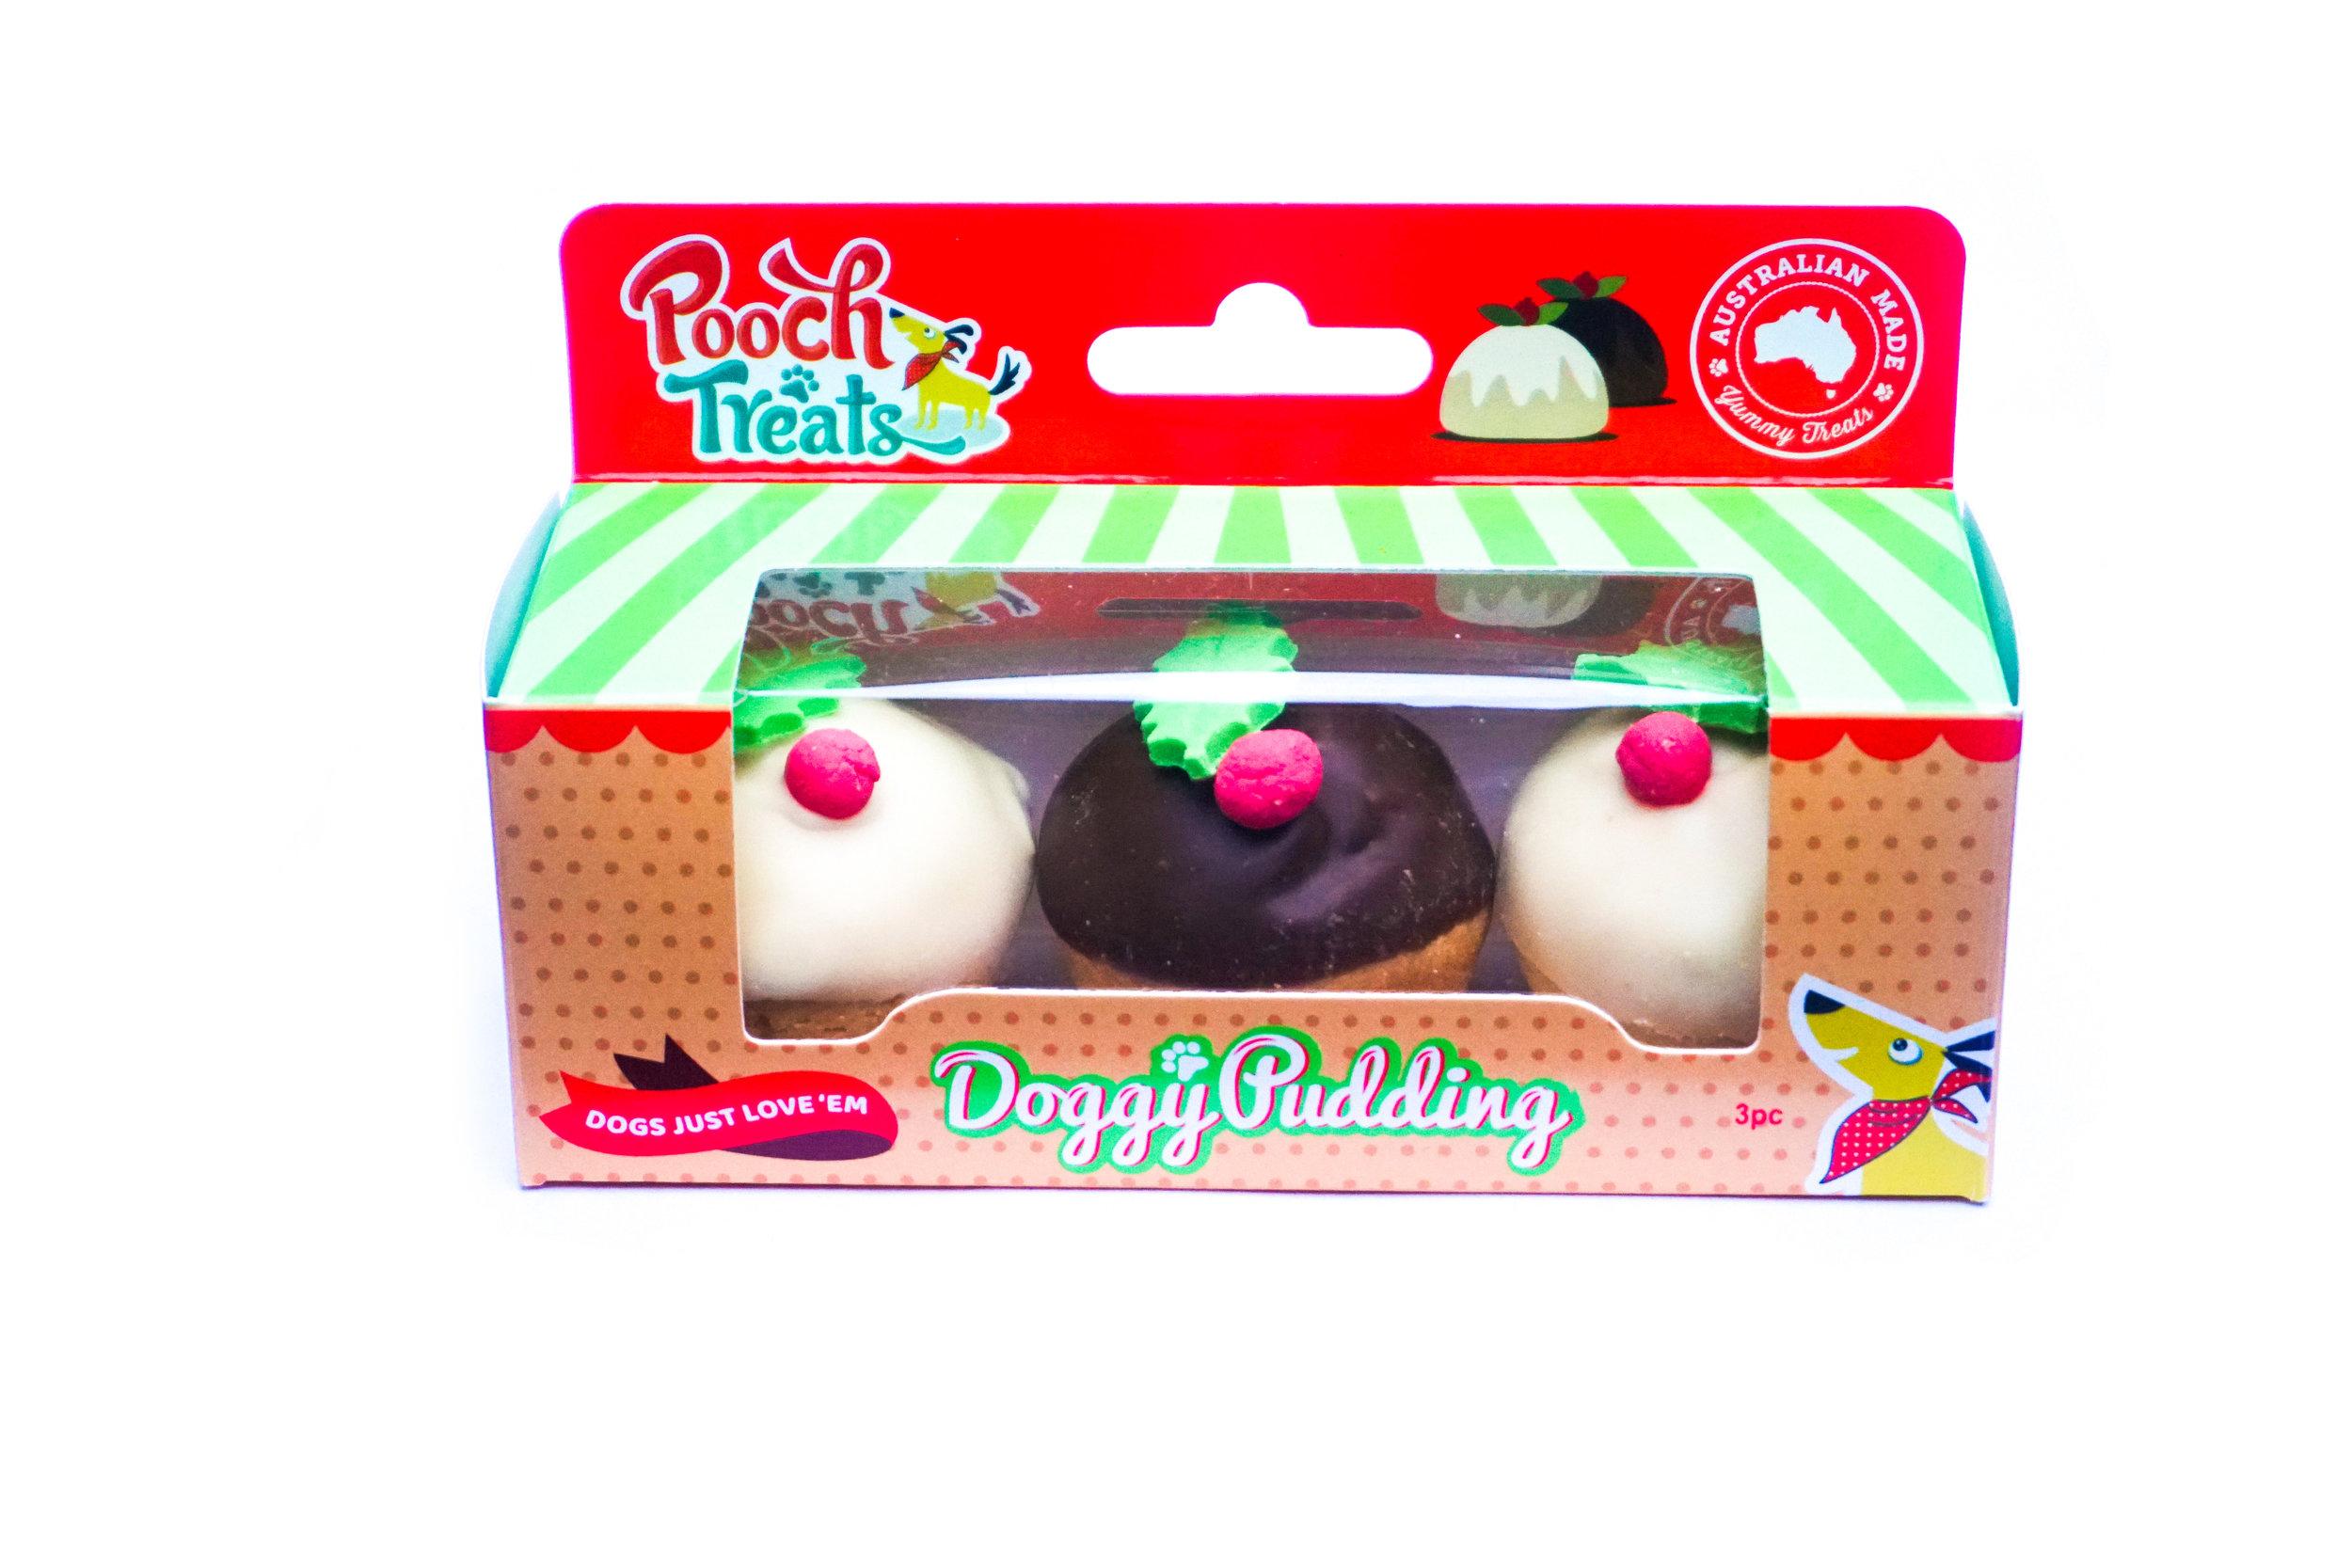 Doggy Puddings (Seasonal)